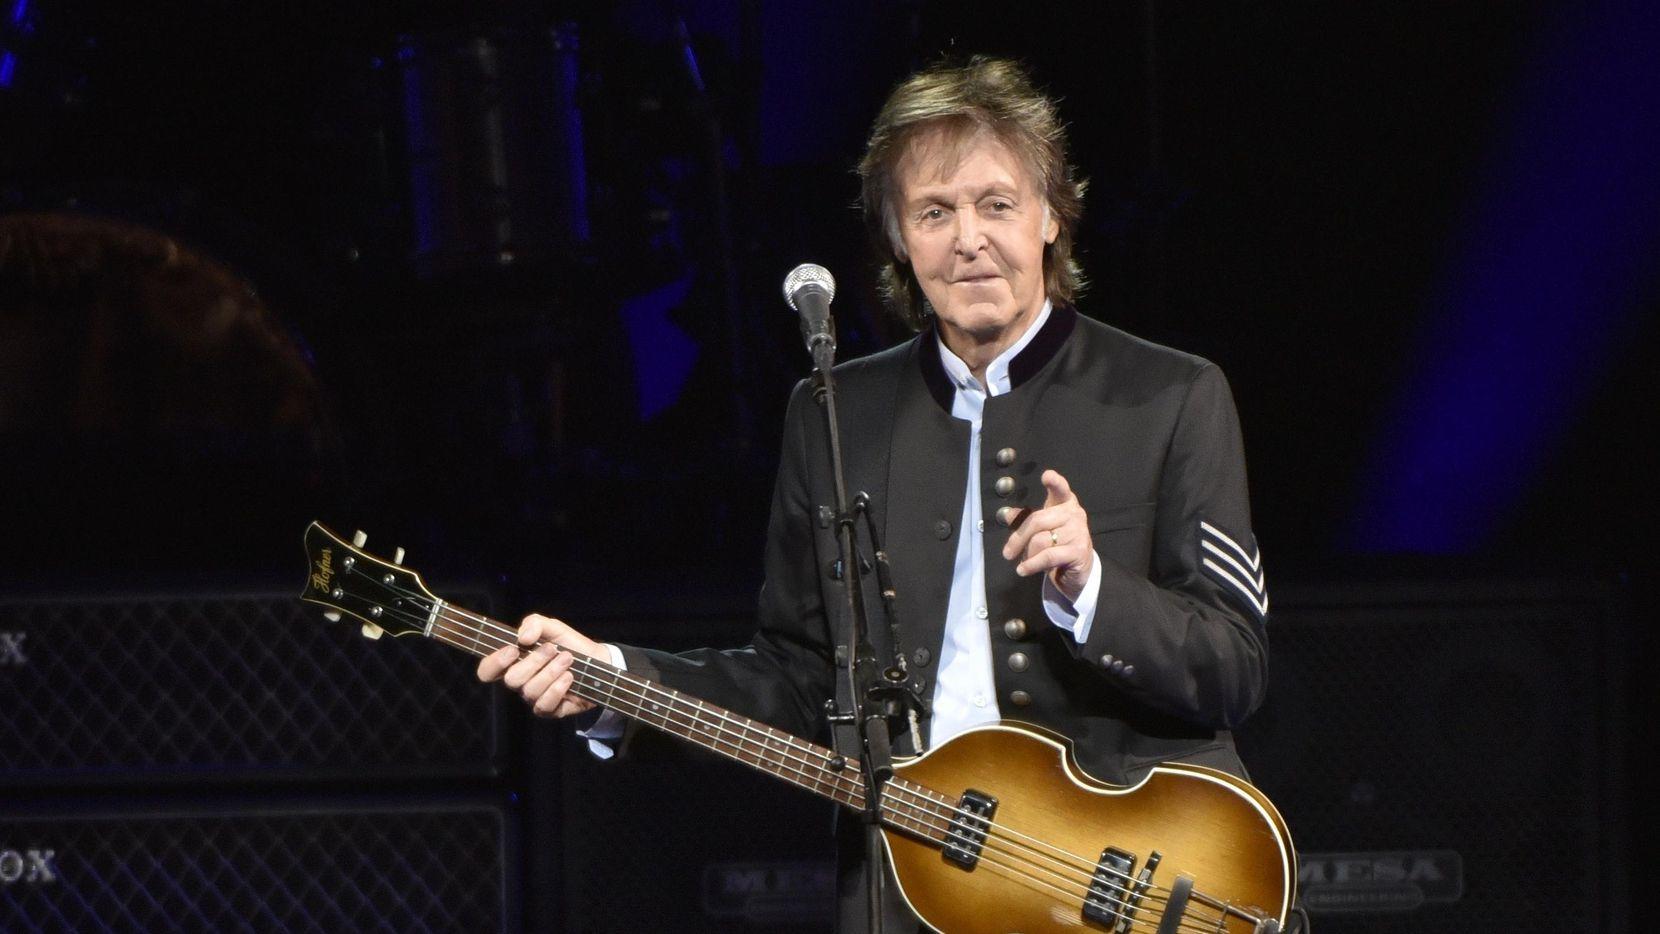 Imagen de 2017 de Paul McCartney en un concierto de su gira One on One Tour en el Hollywood Casino Amphitheatre de Tinley Park, Illinois. (Rob Grabowski/Invision/AP/Rob Grabowski)